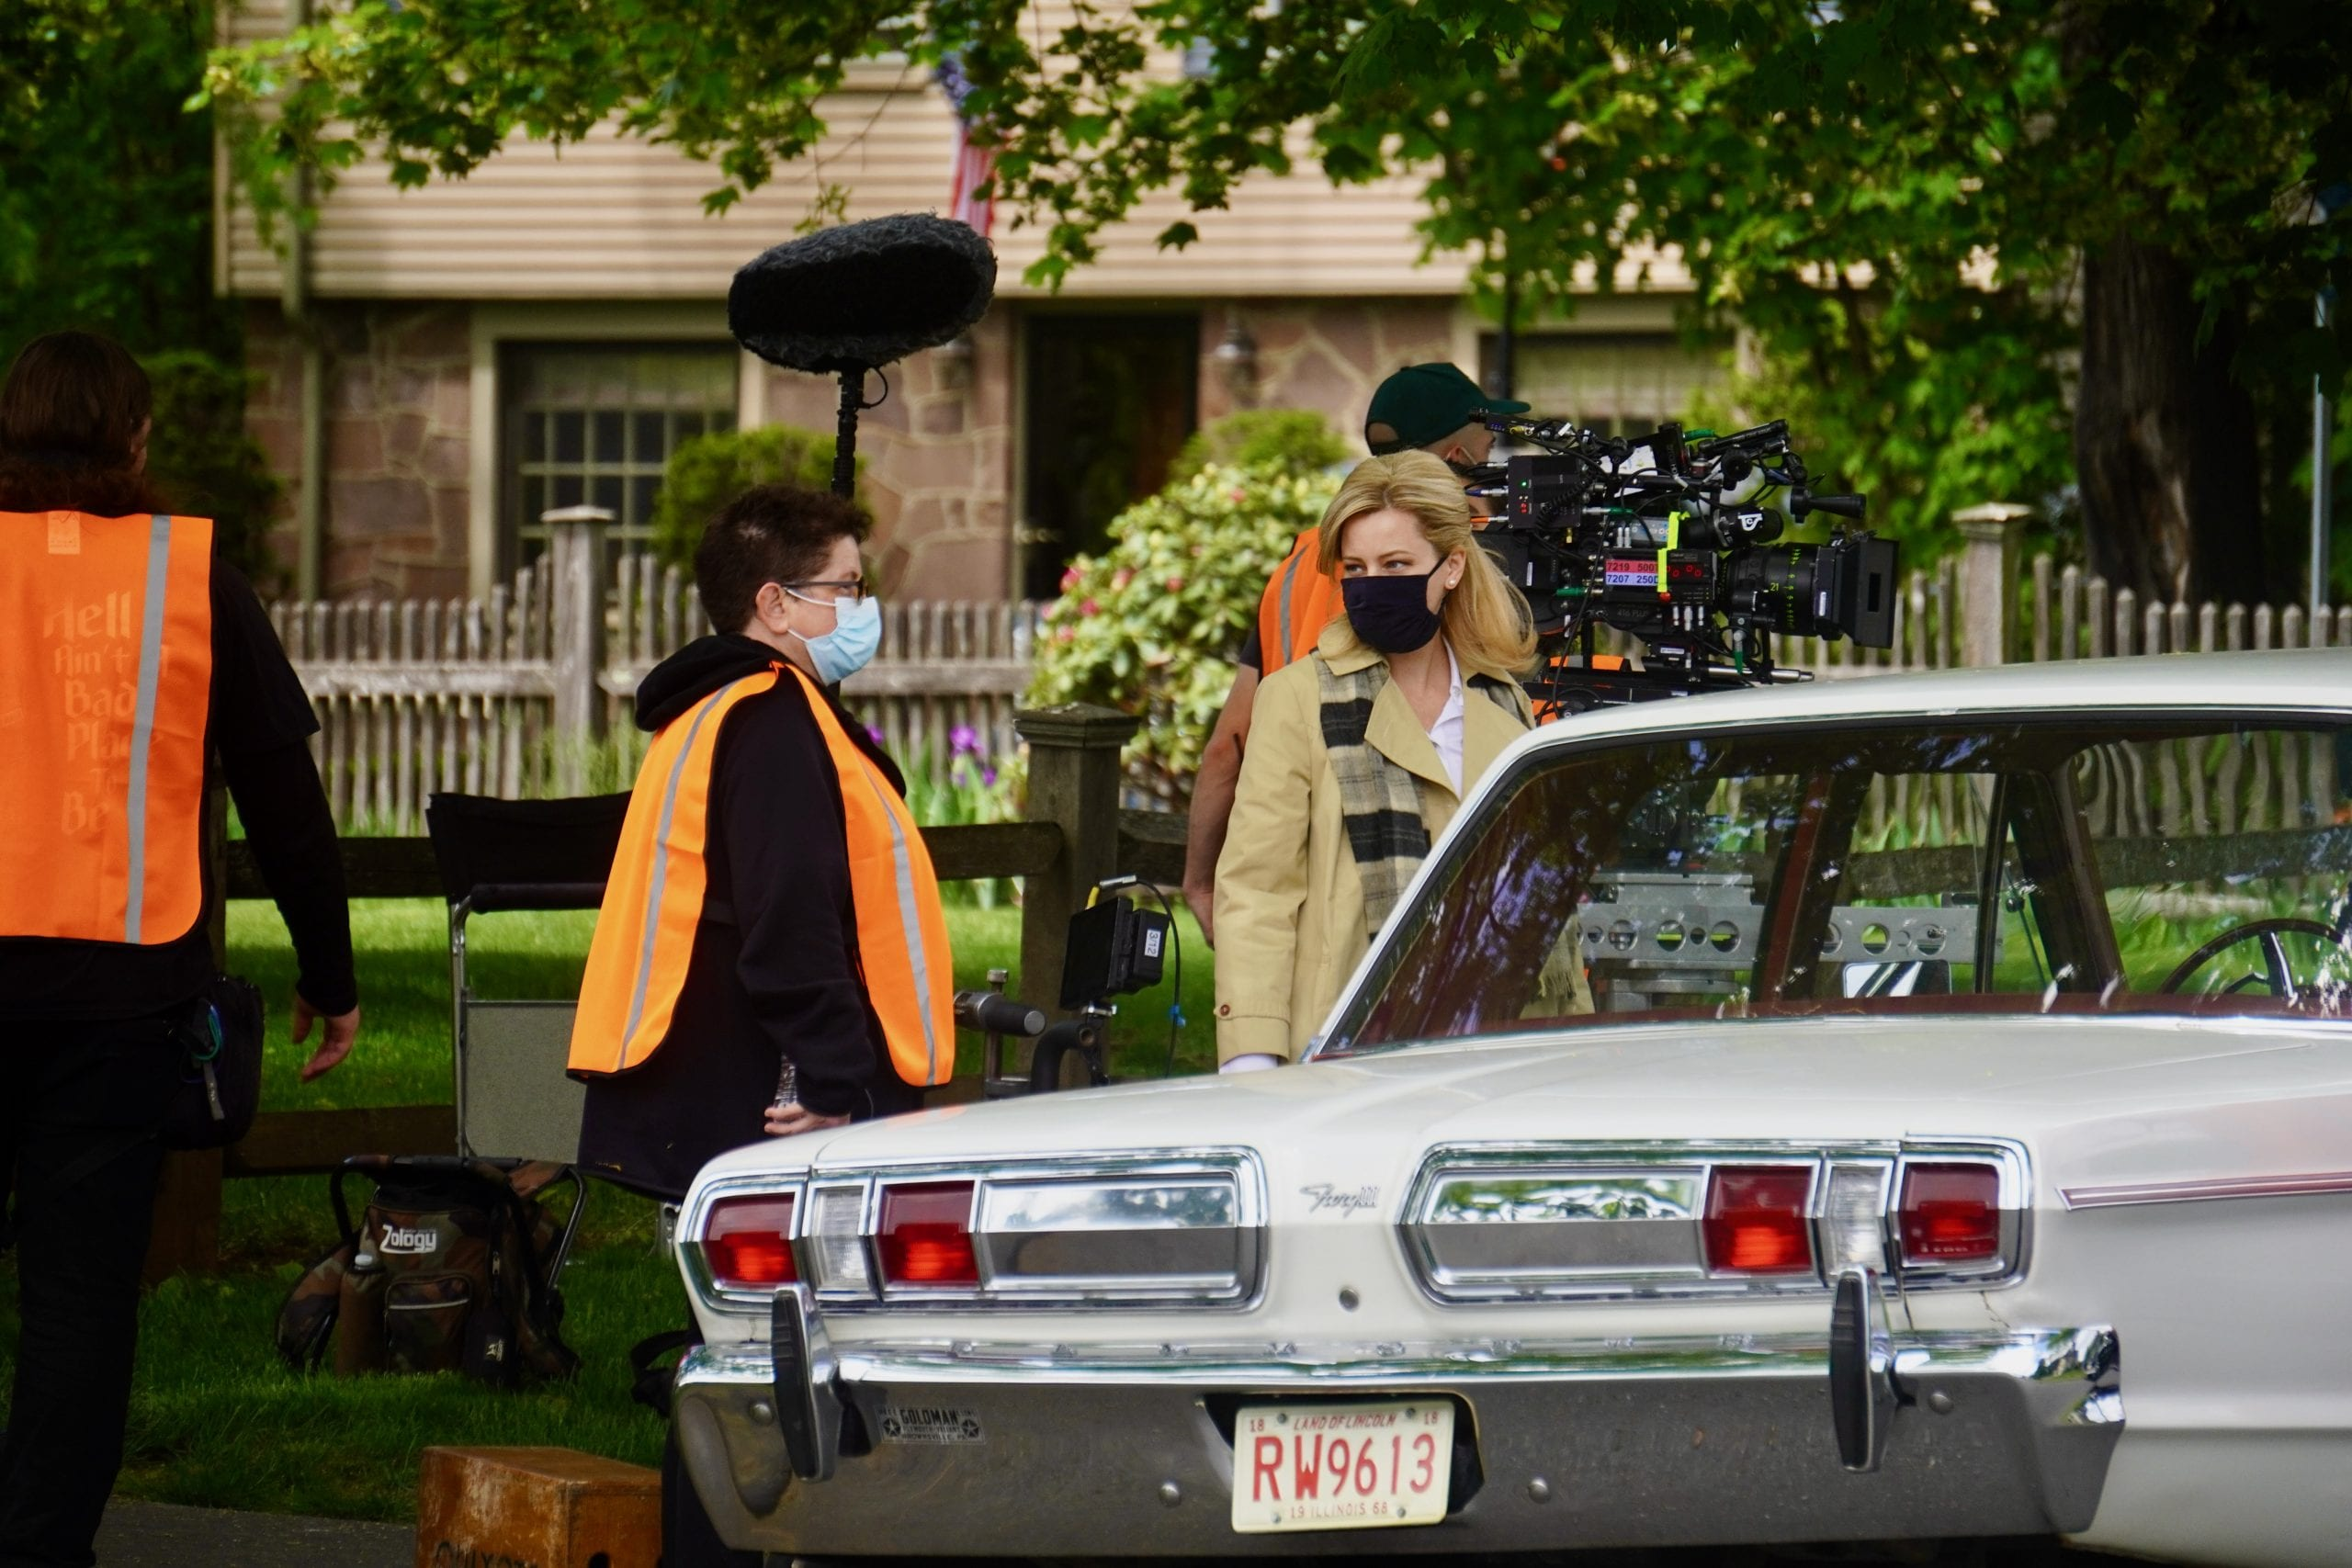 West Hartford Sites Serve as Stage for Hollywood Movie - We-Ha   West Hartford News